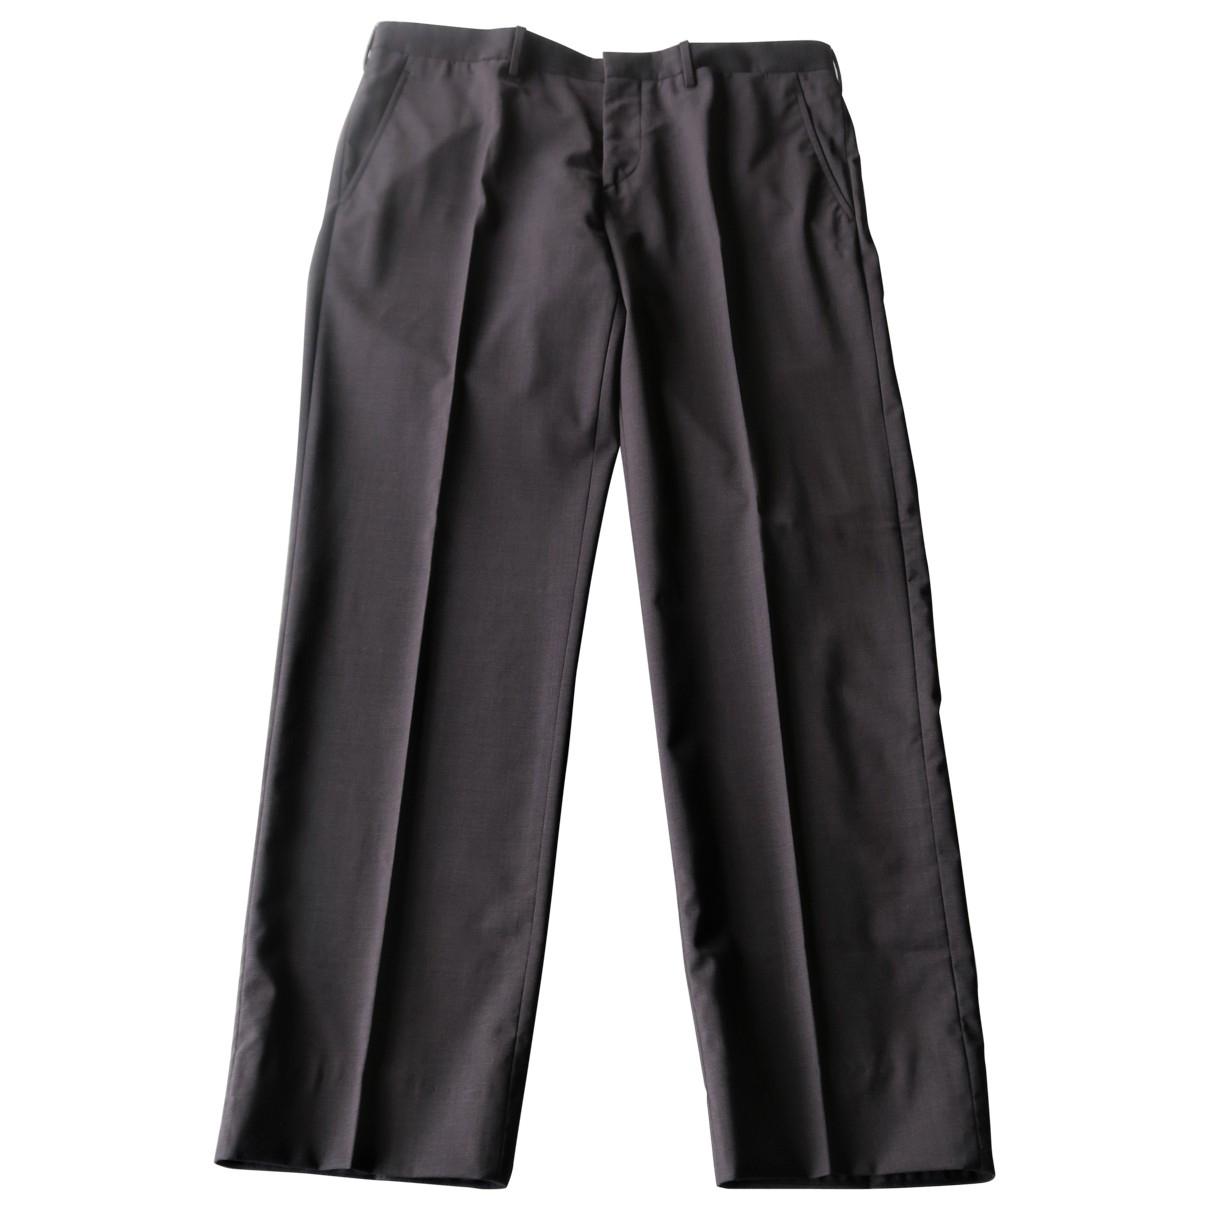 Prada \N Anthracite Wool Trousers for Men 50 IT